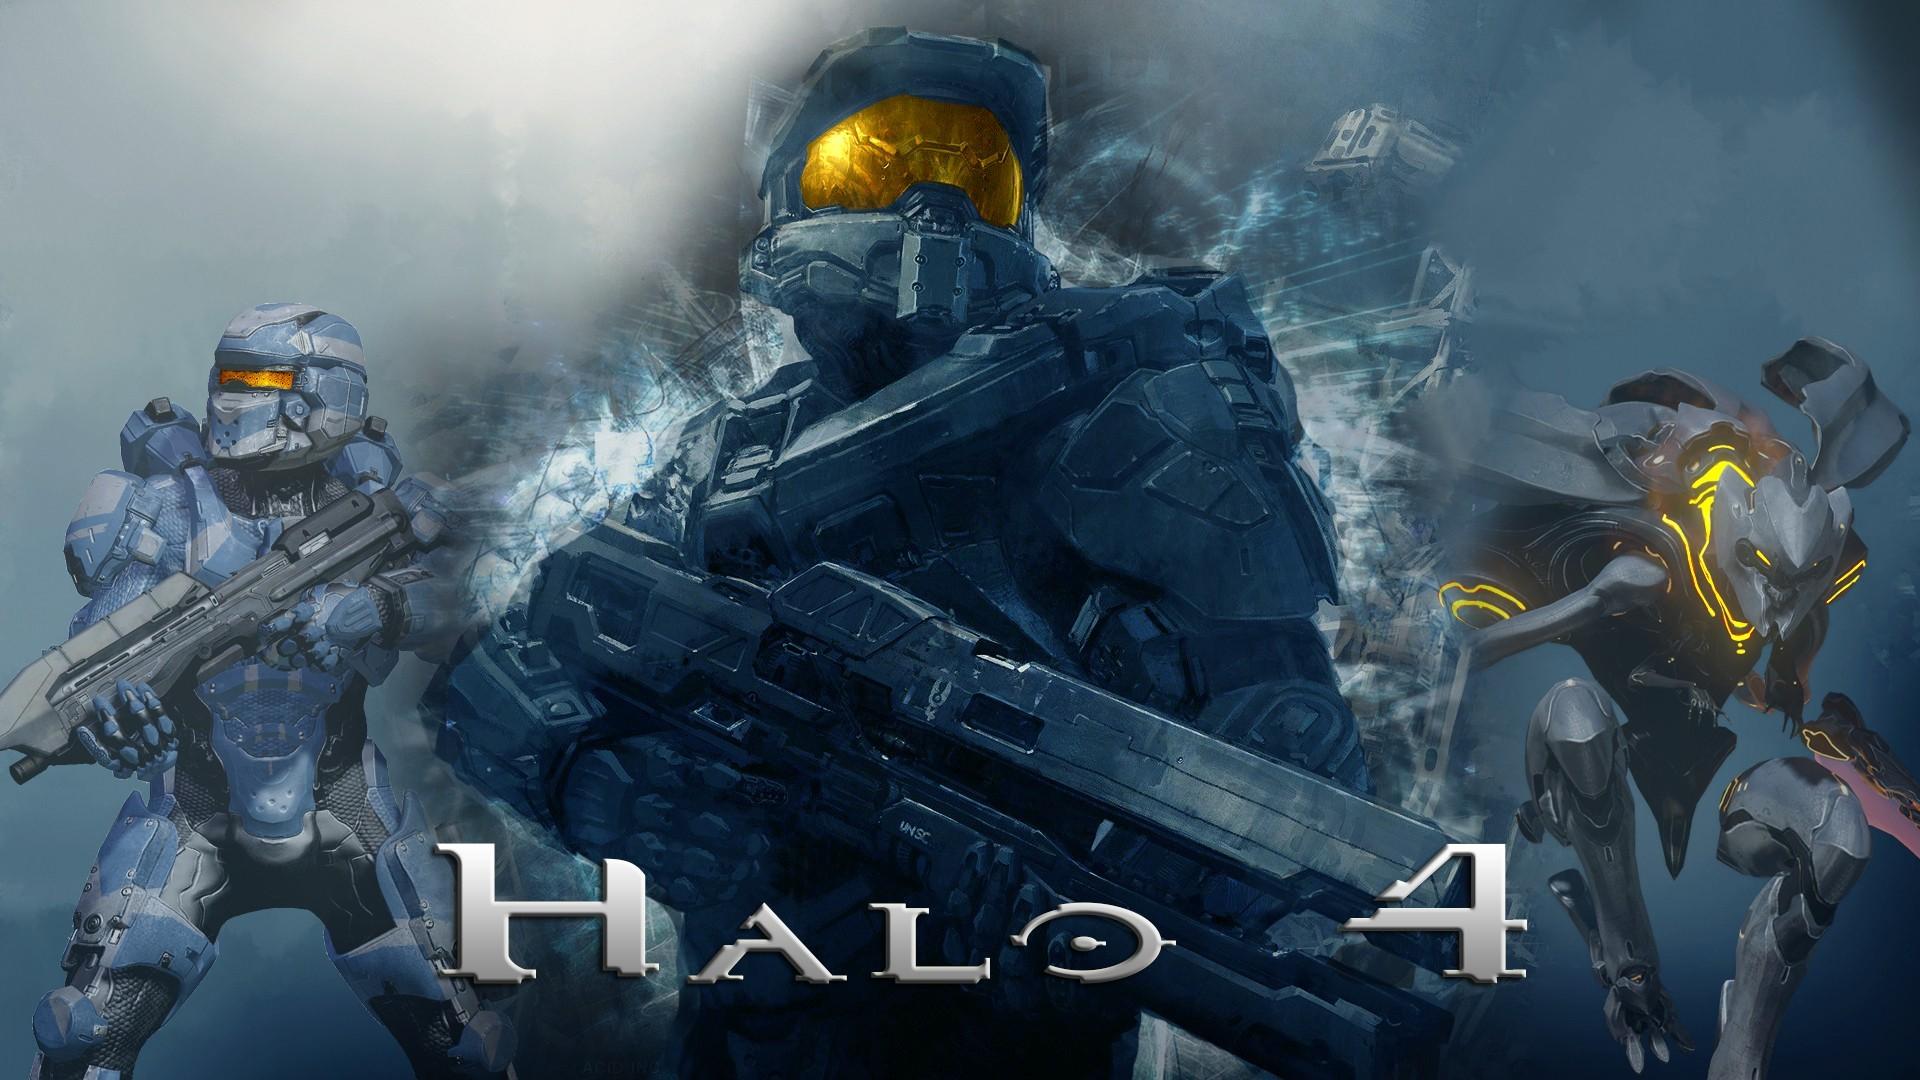 Res: 1920x1080, Halo Master Chief Halo 4 Forerunner Promethean Spartan IV wallpaper |   | 209961 | WallpaperUP